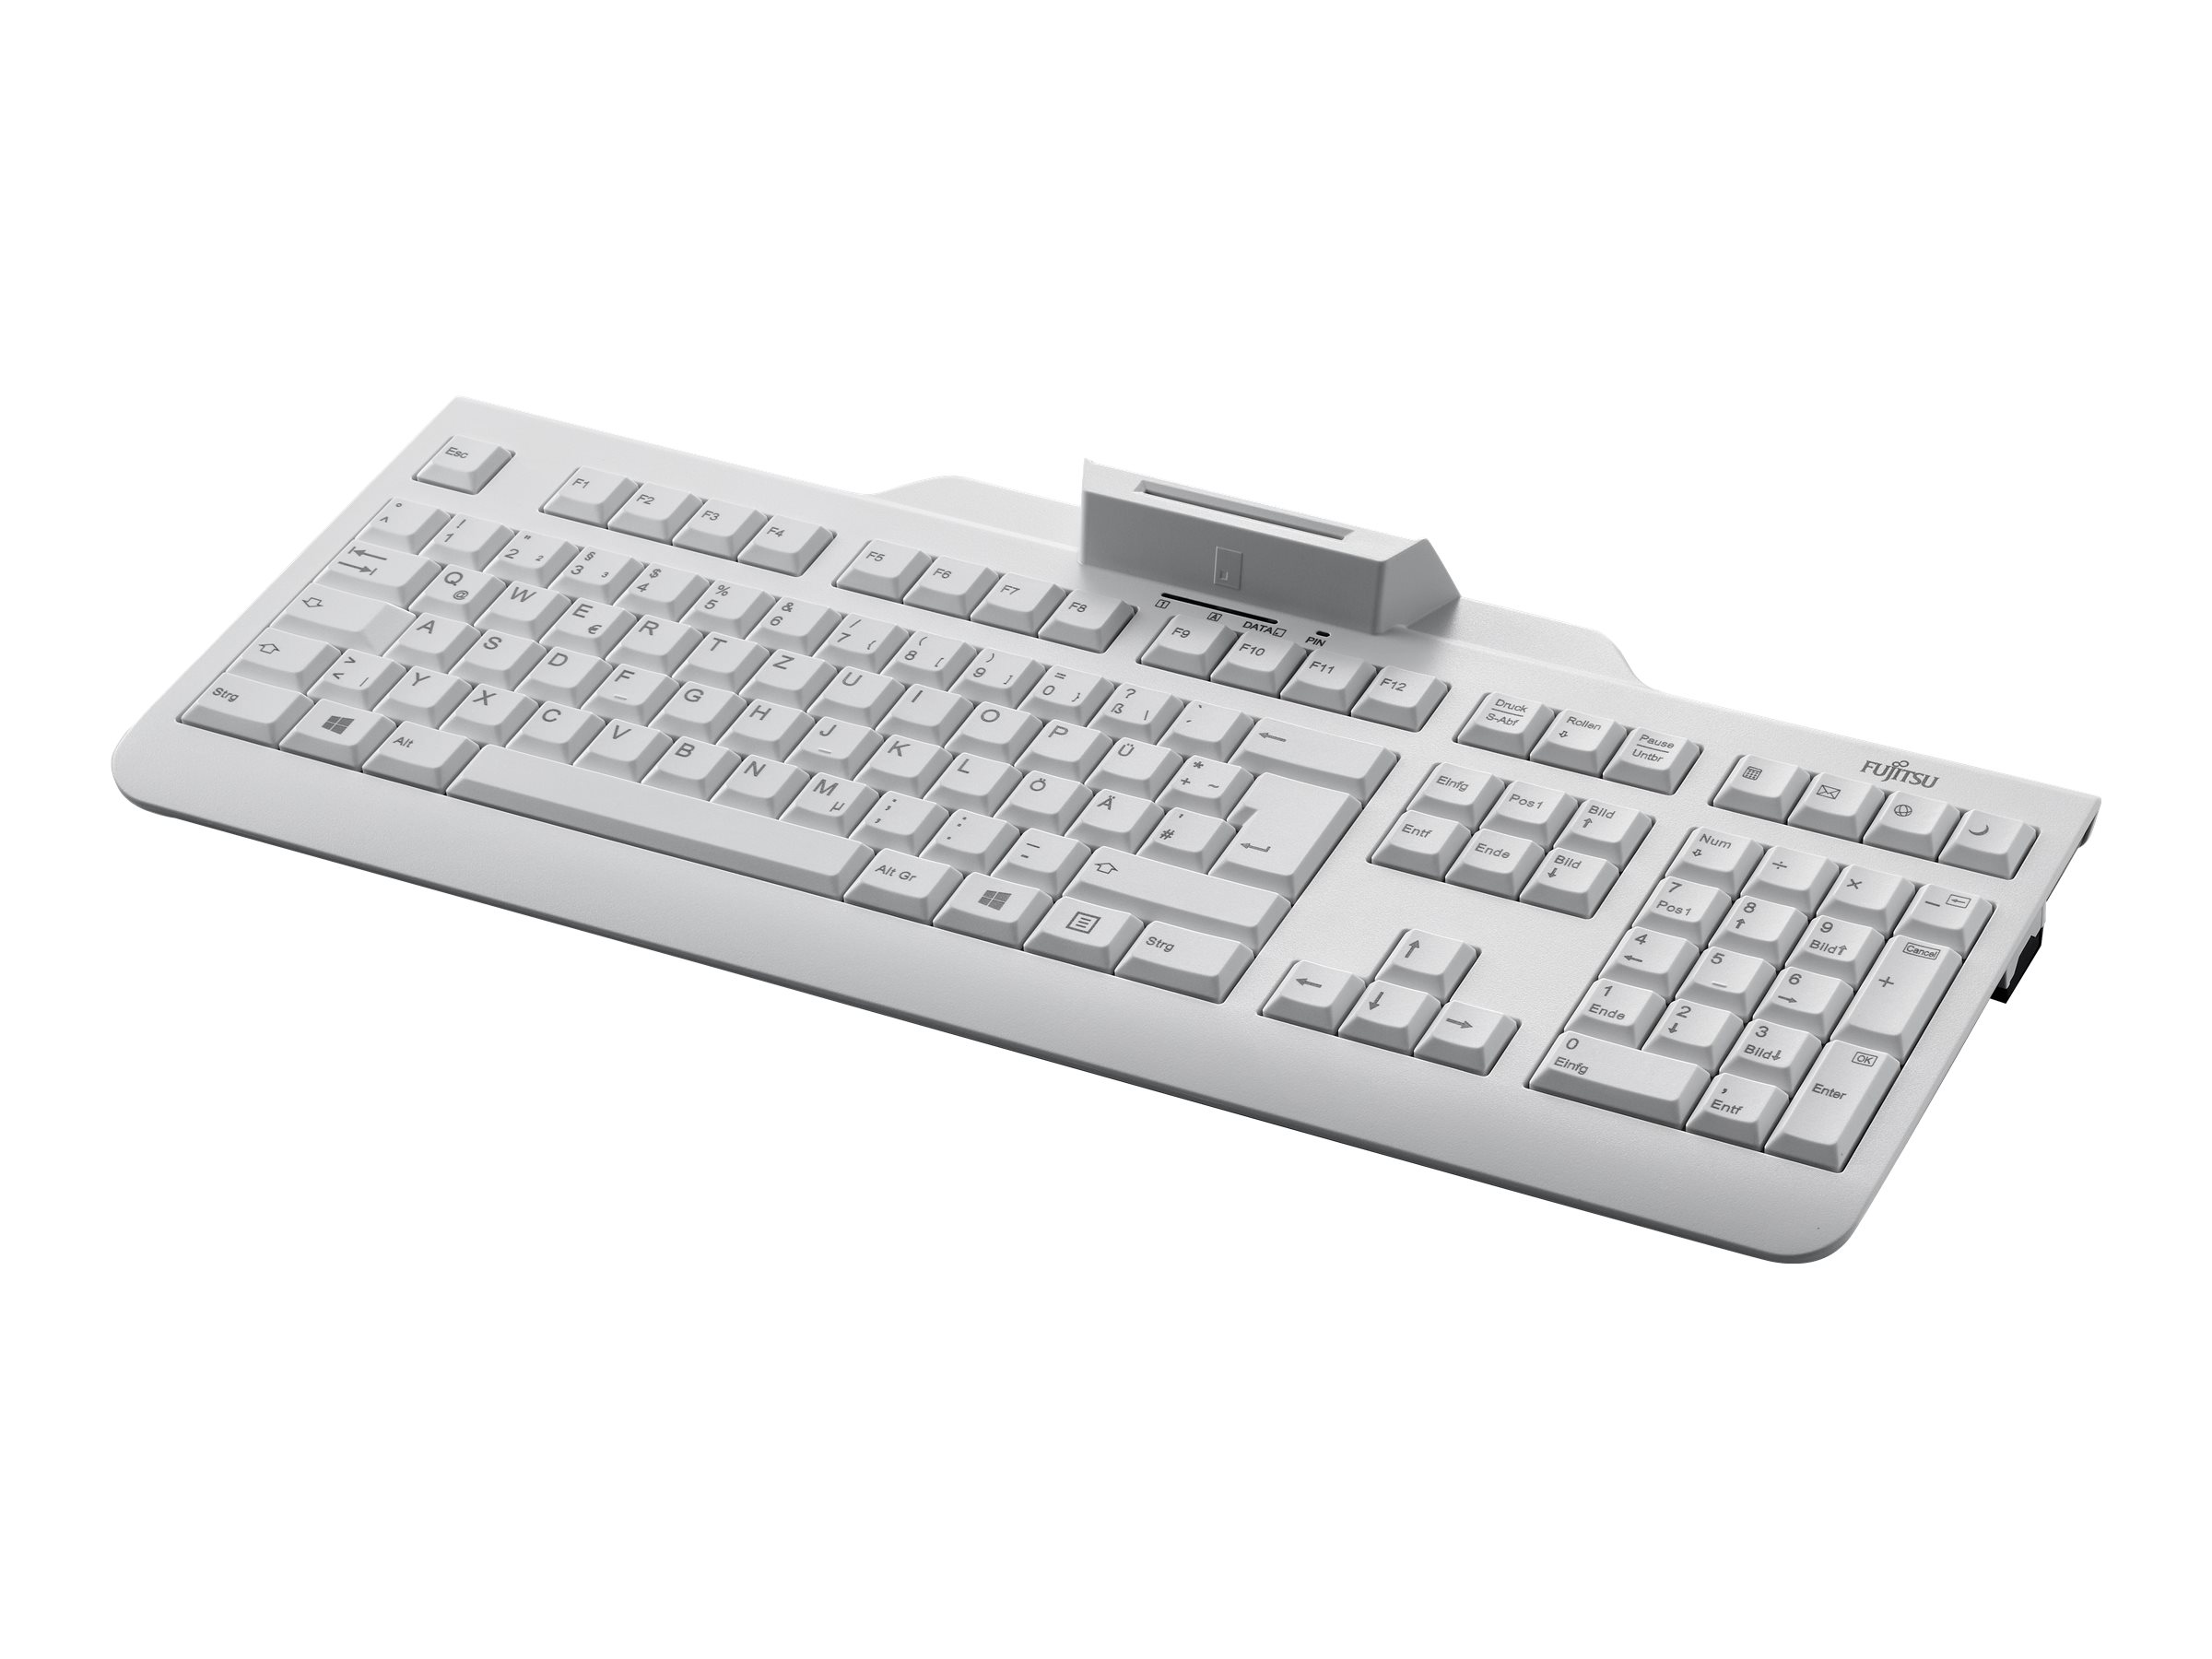 Fujitsu KB 100 SCR - Tastatur - USB - Nordisch